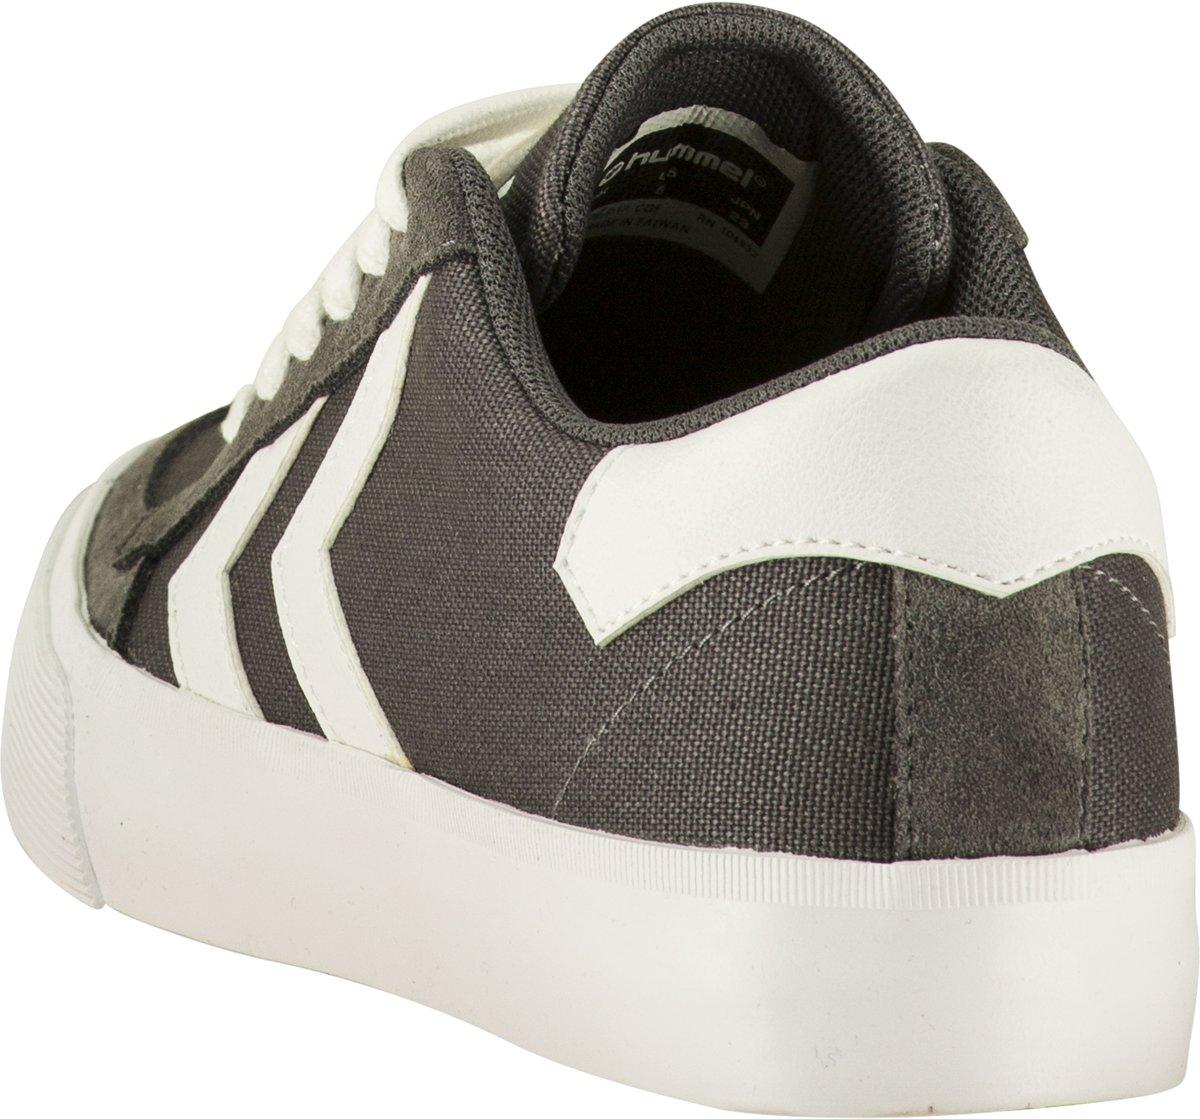 Hummel Sl. Hummel Sl. Stadil Duo Canvas Low - Sneakers - Volwassenen - Castle Rock - Maat 40 Stadil Toile Duo Bas - Chaussures De Sport - Adultes - Castlerock - Taille 40 3N8ytcVxA